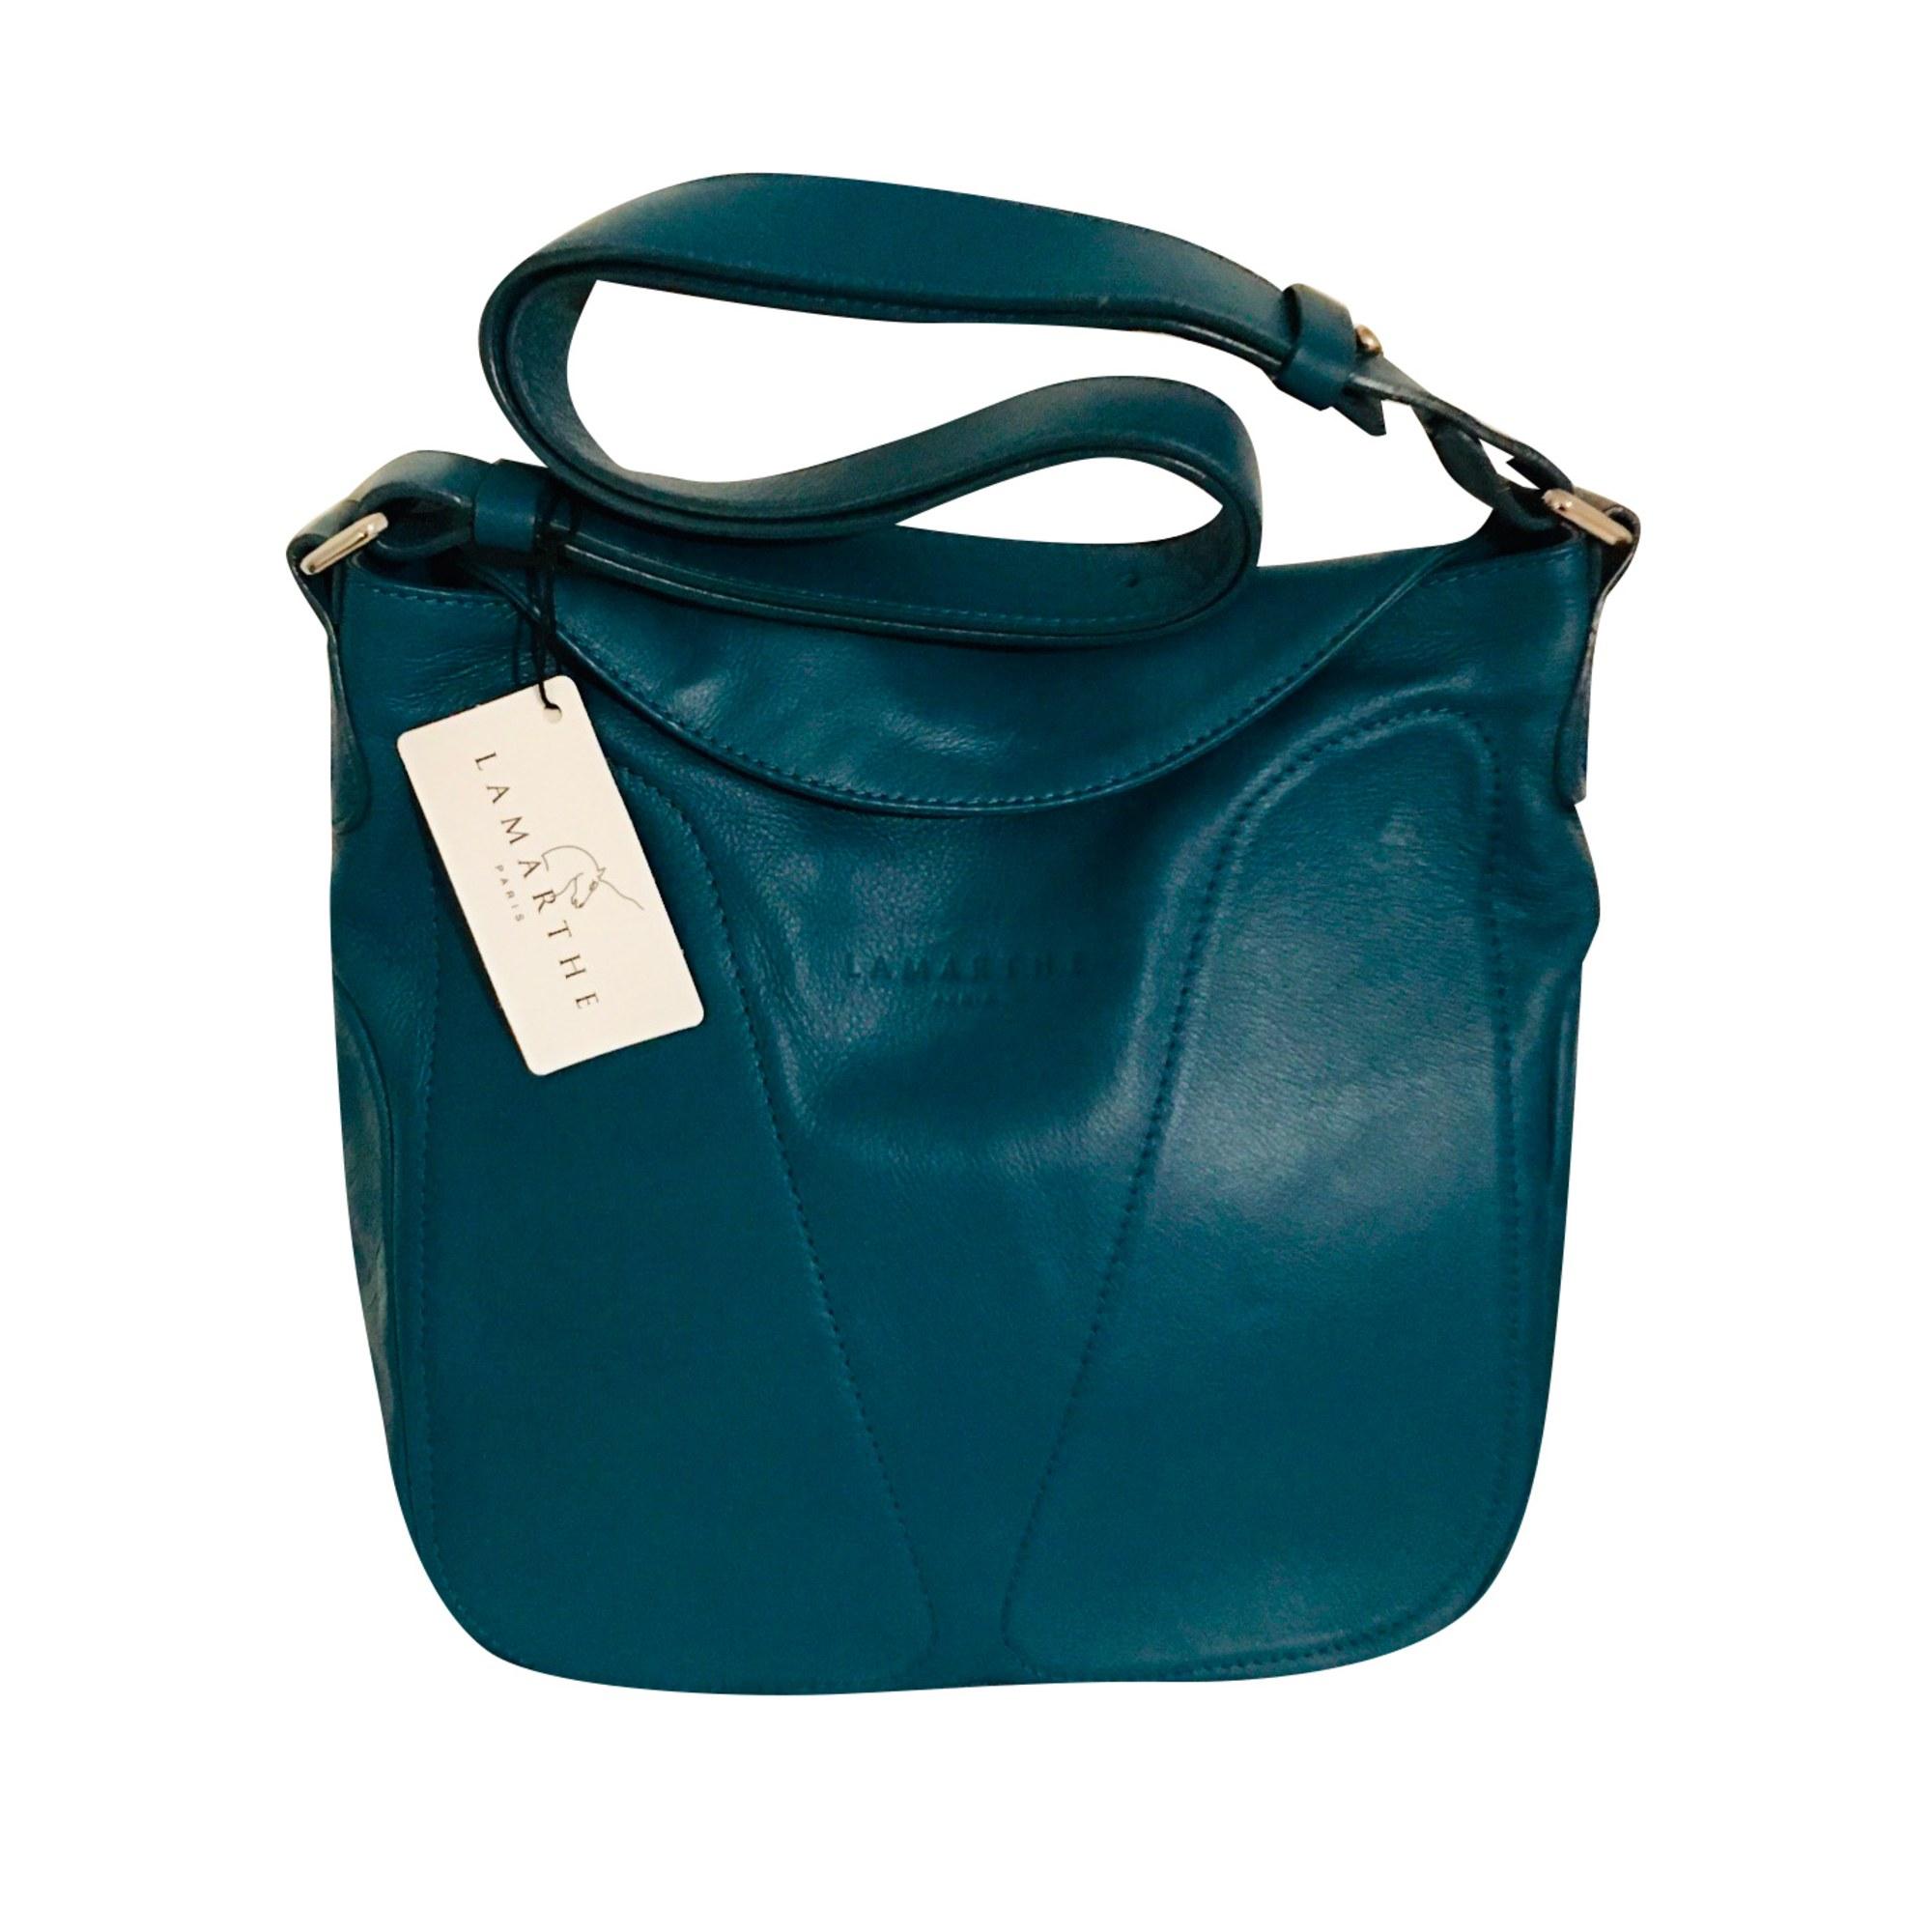 Sac en bandoulière en cuir LAMARTHE Bleu, bleu marine, bleu turquoise